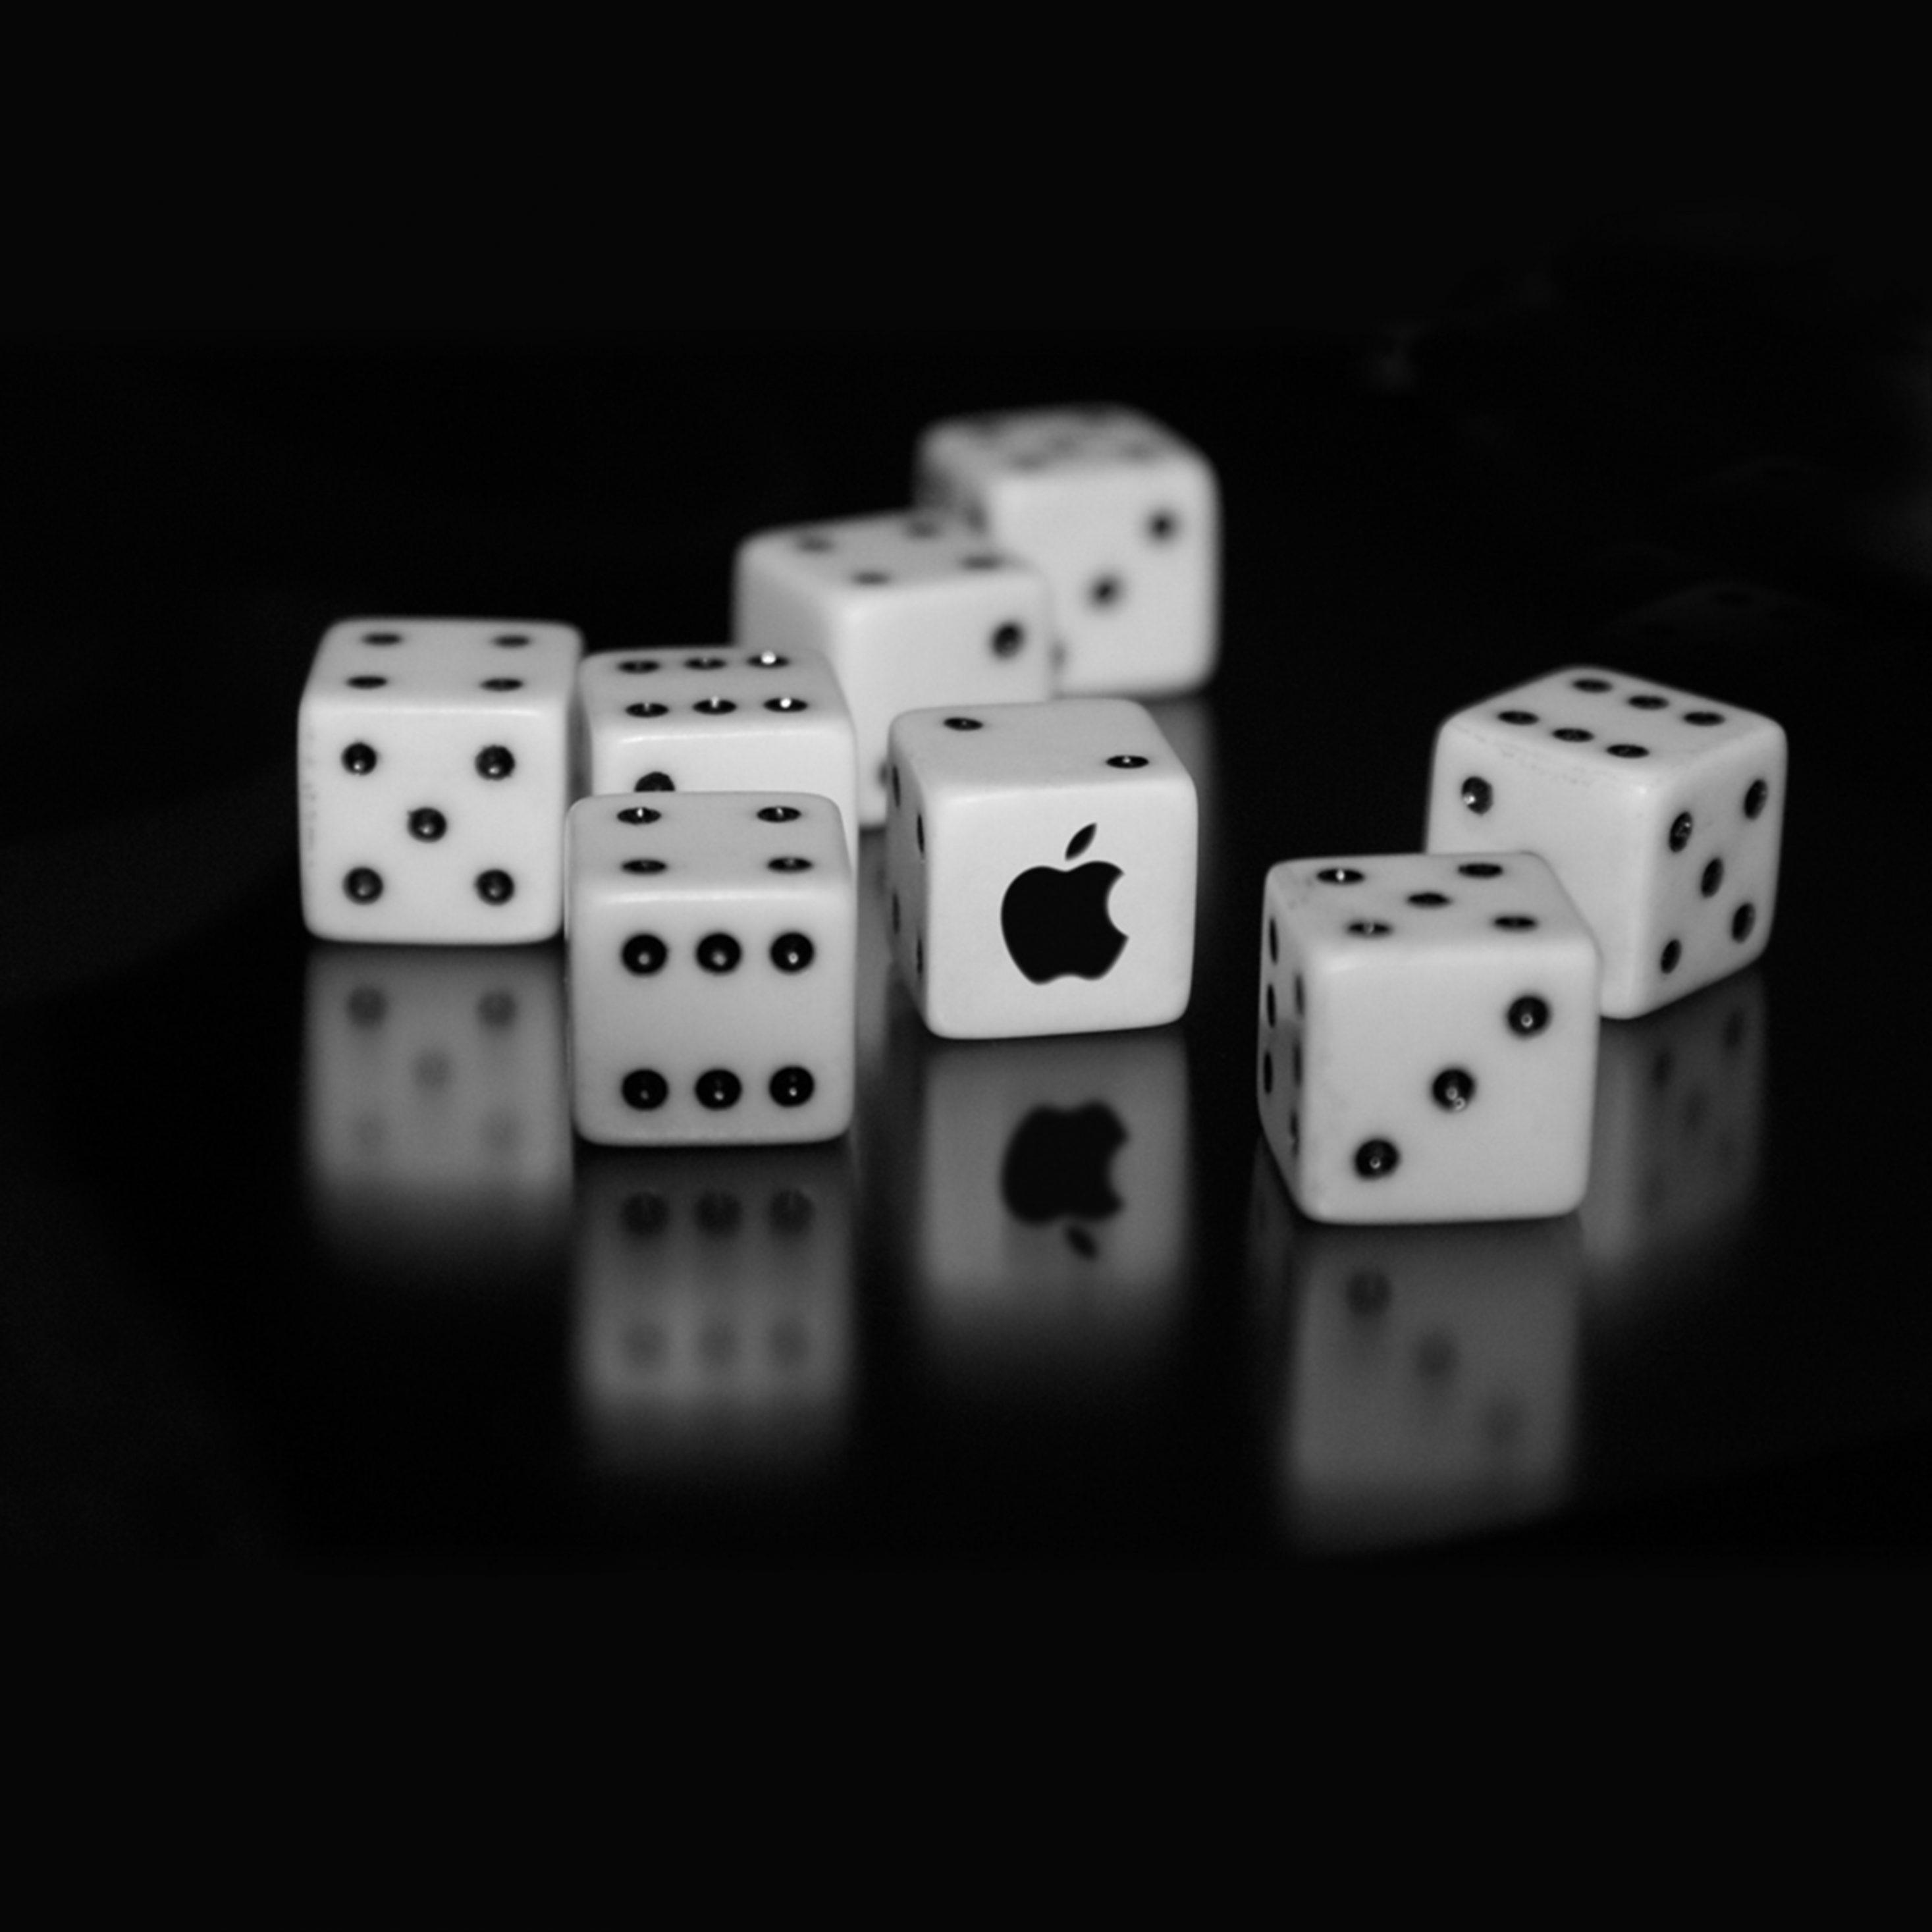 2934x2934 iOS iPad wallpaper 4k Apple Logo Dice Ipad Wallpaper 2934x2934 pixels resolution